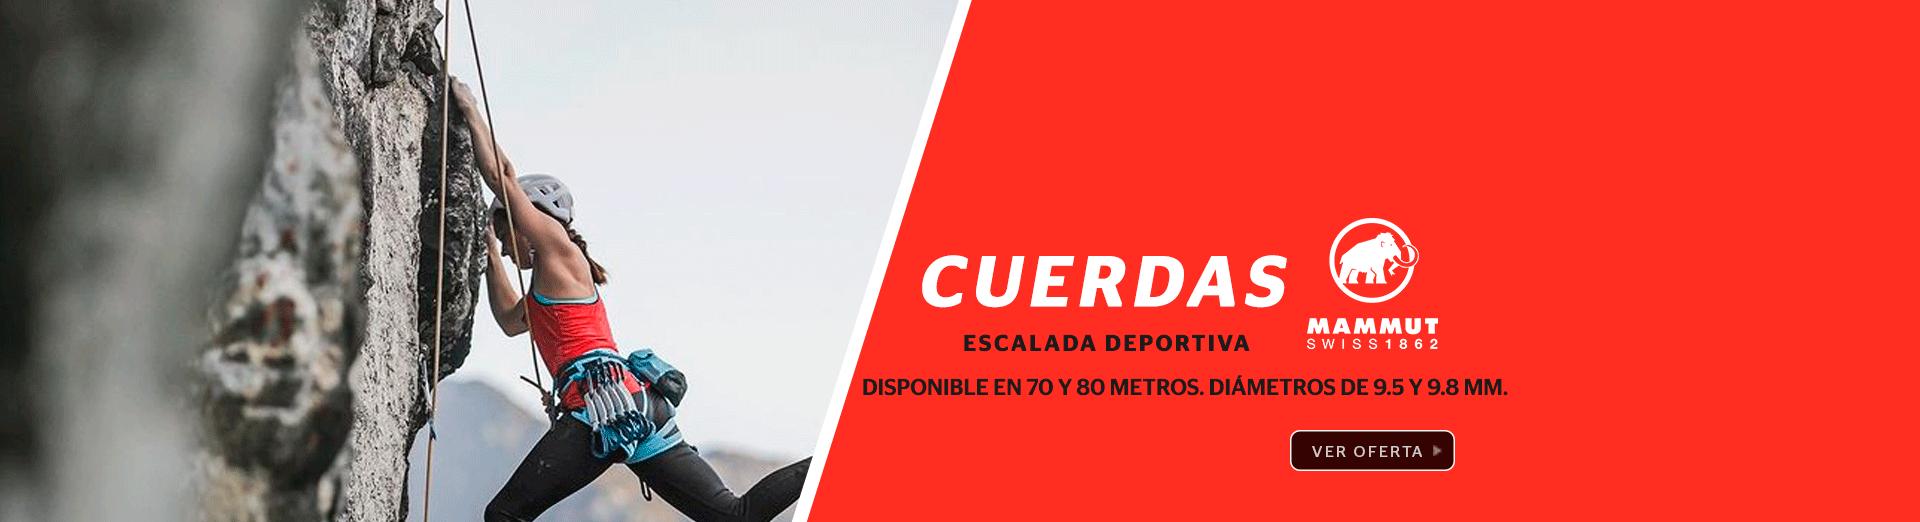 OFERTA CUERDAS ESCALADA MAMMUT